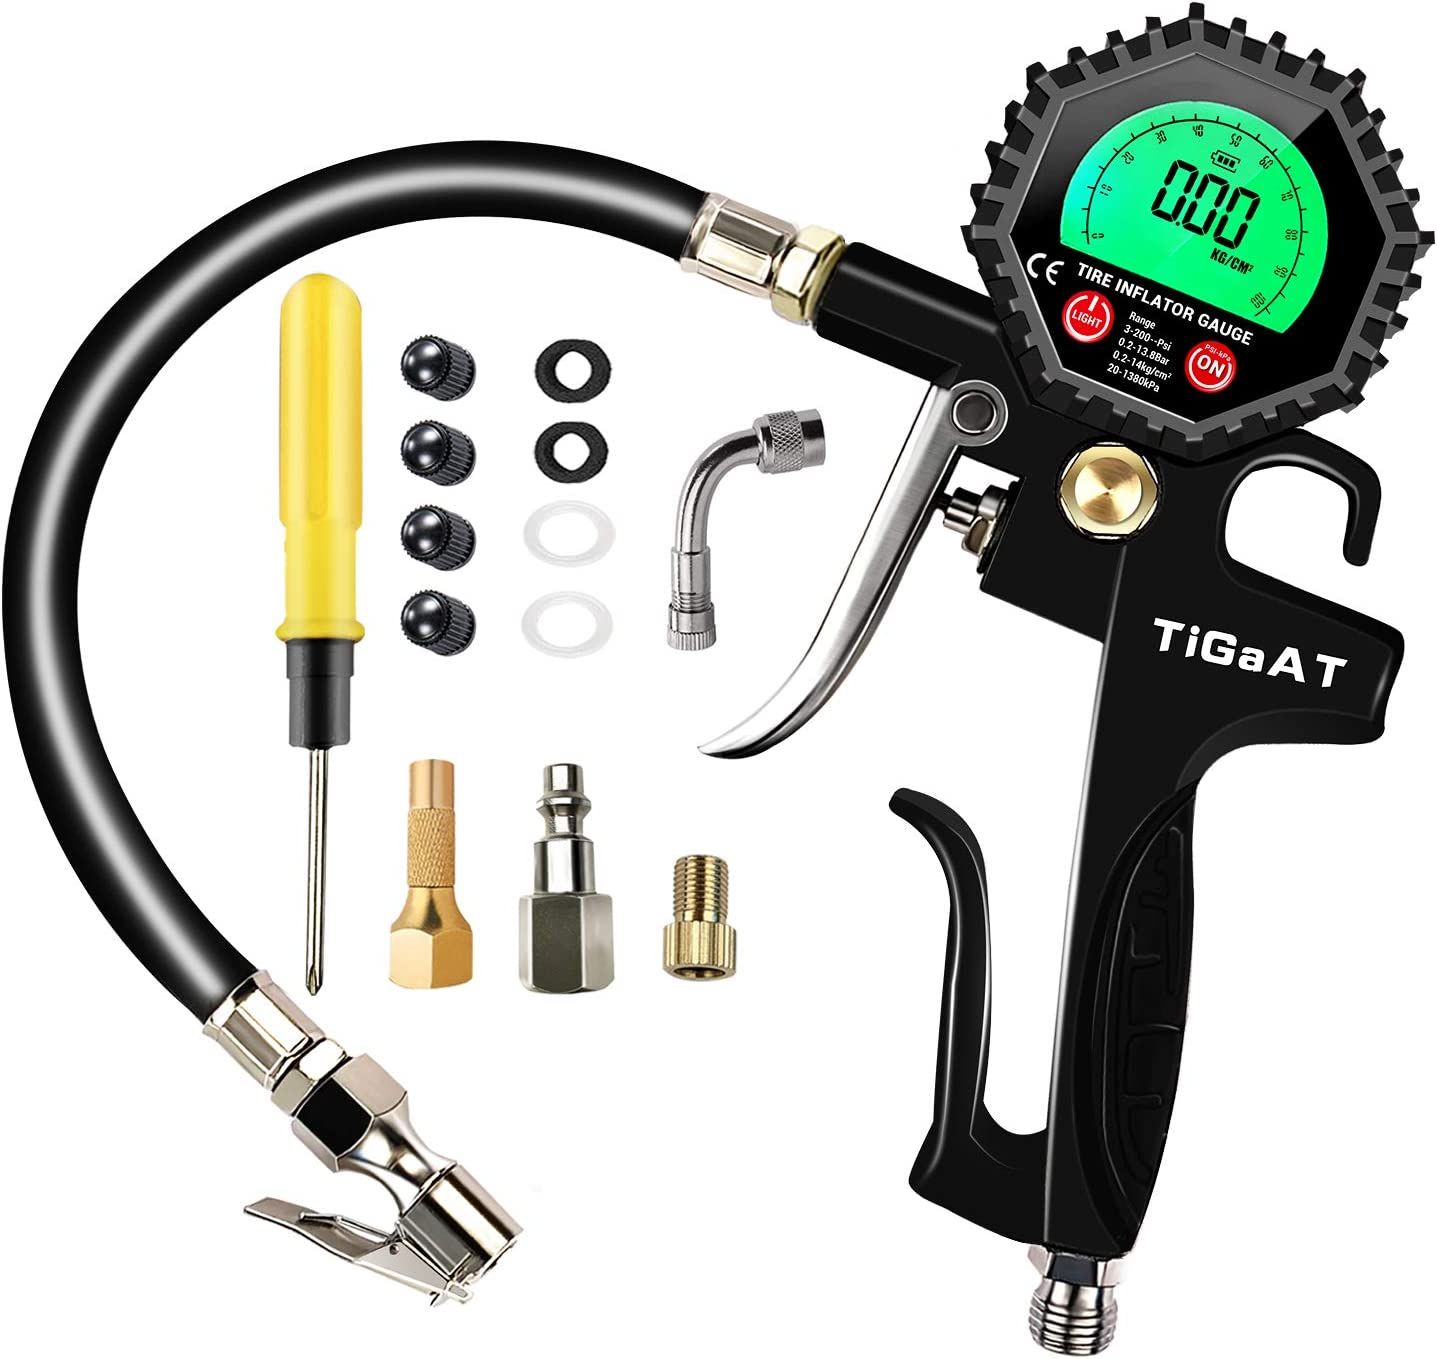 TiGaAT Digital Tire Pressure Gauge